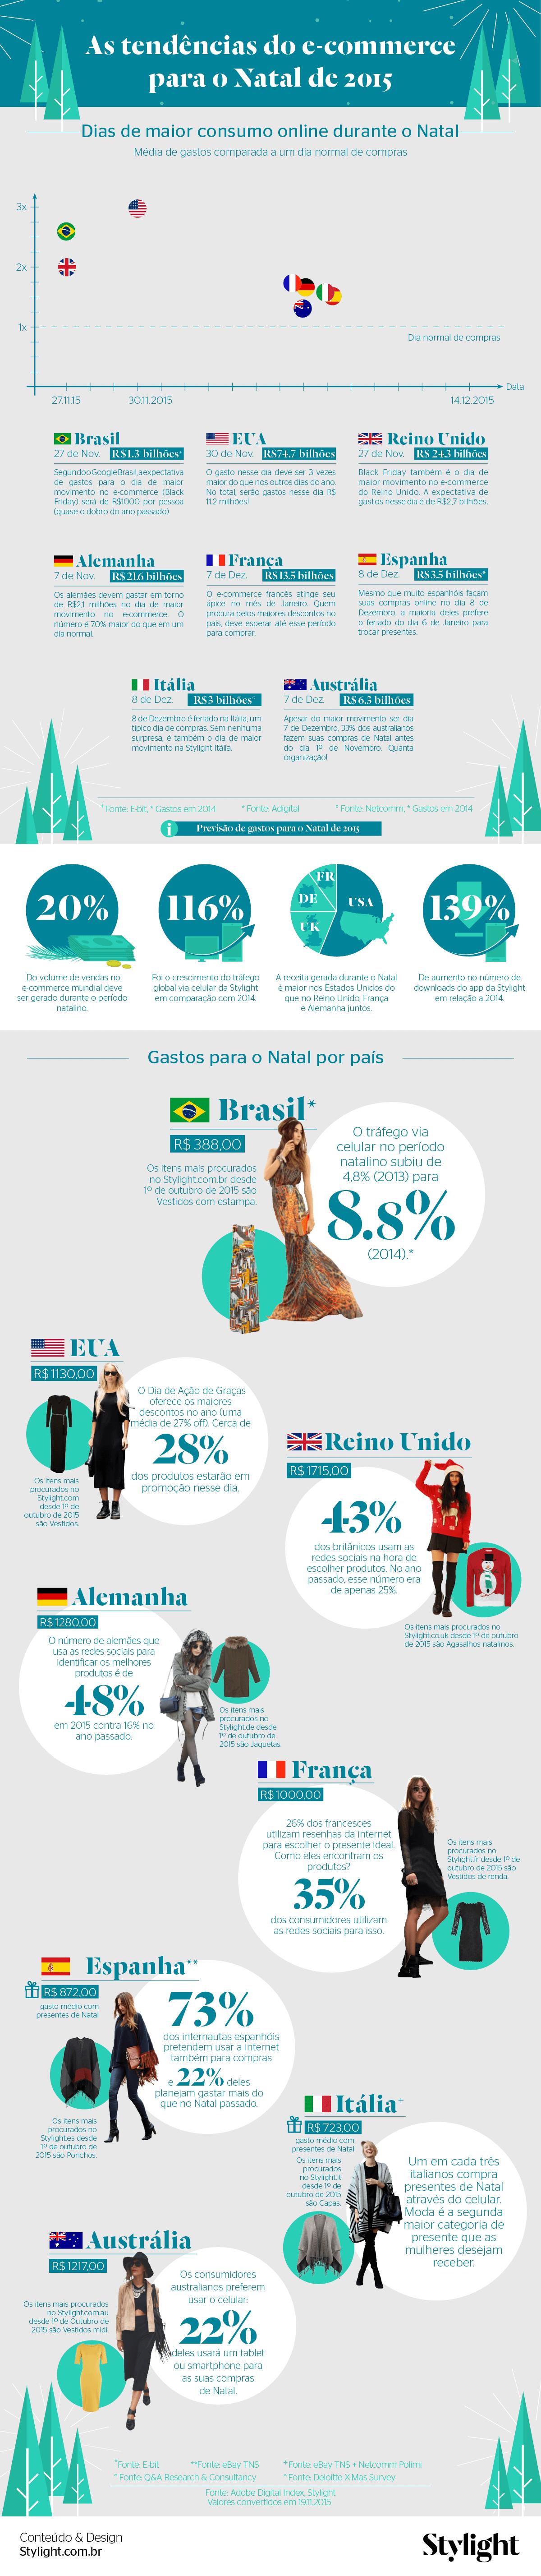 infografico-ecommerce-natal-2015